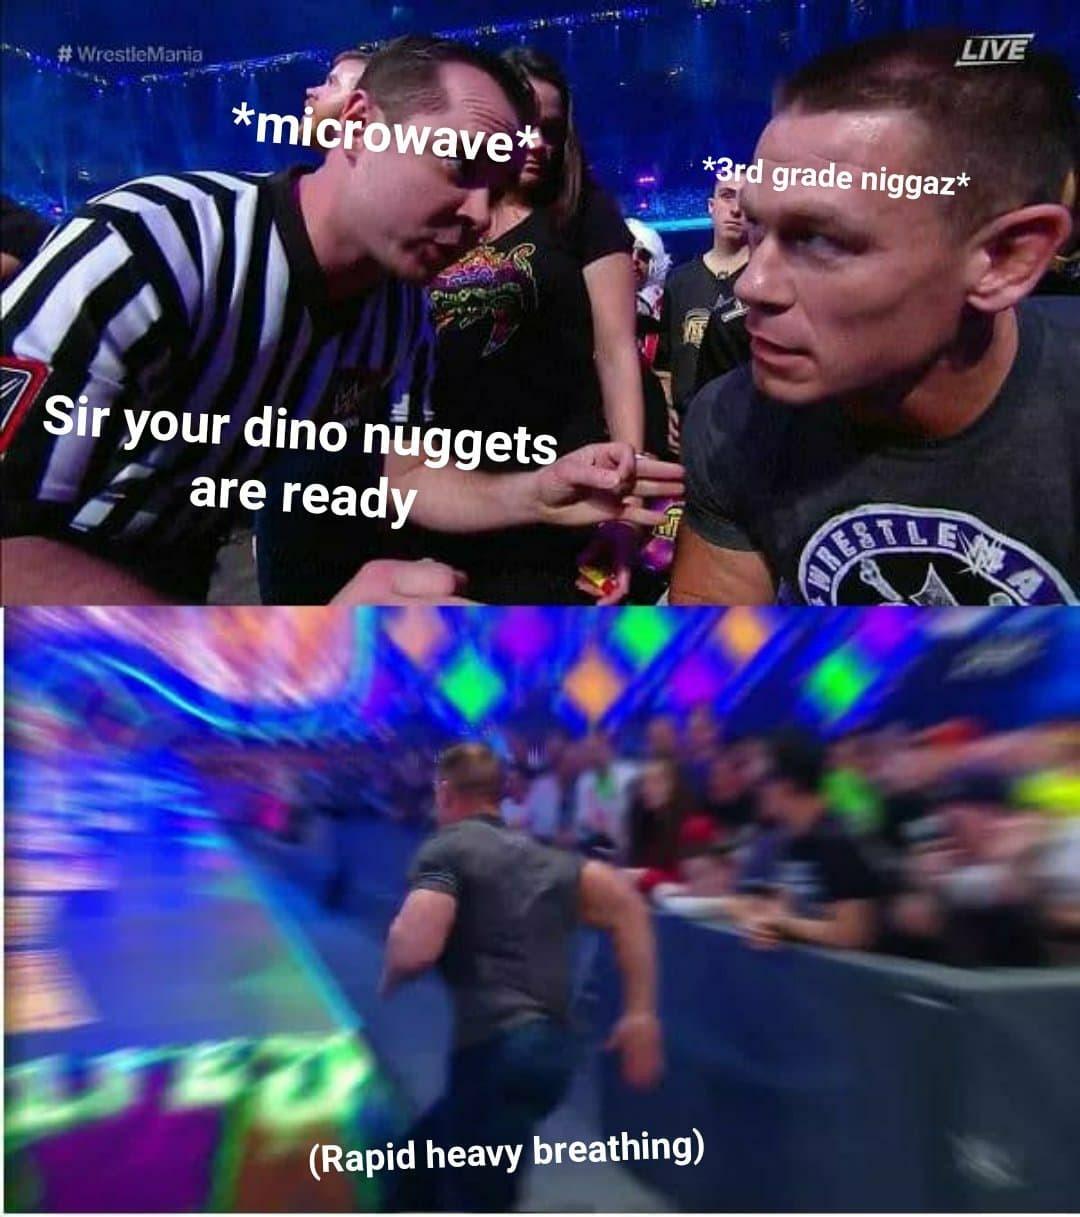 Dino nuggets - meme